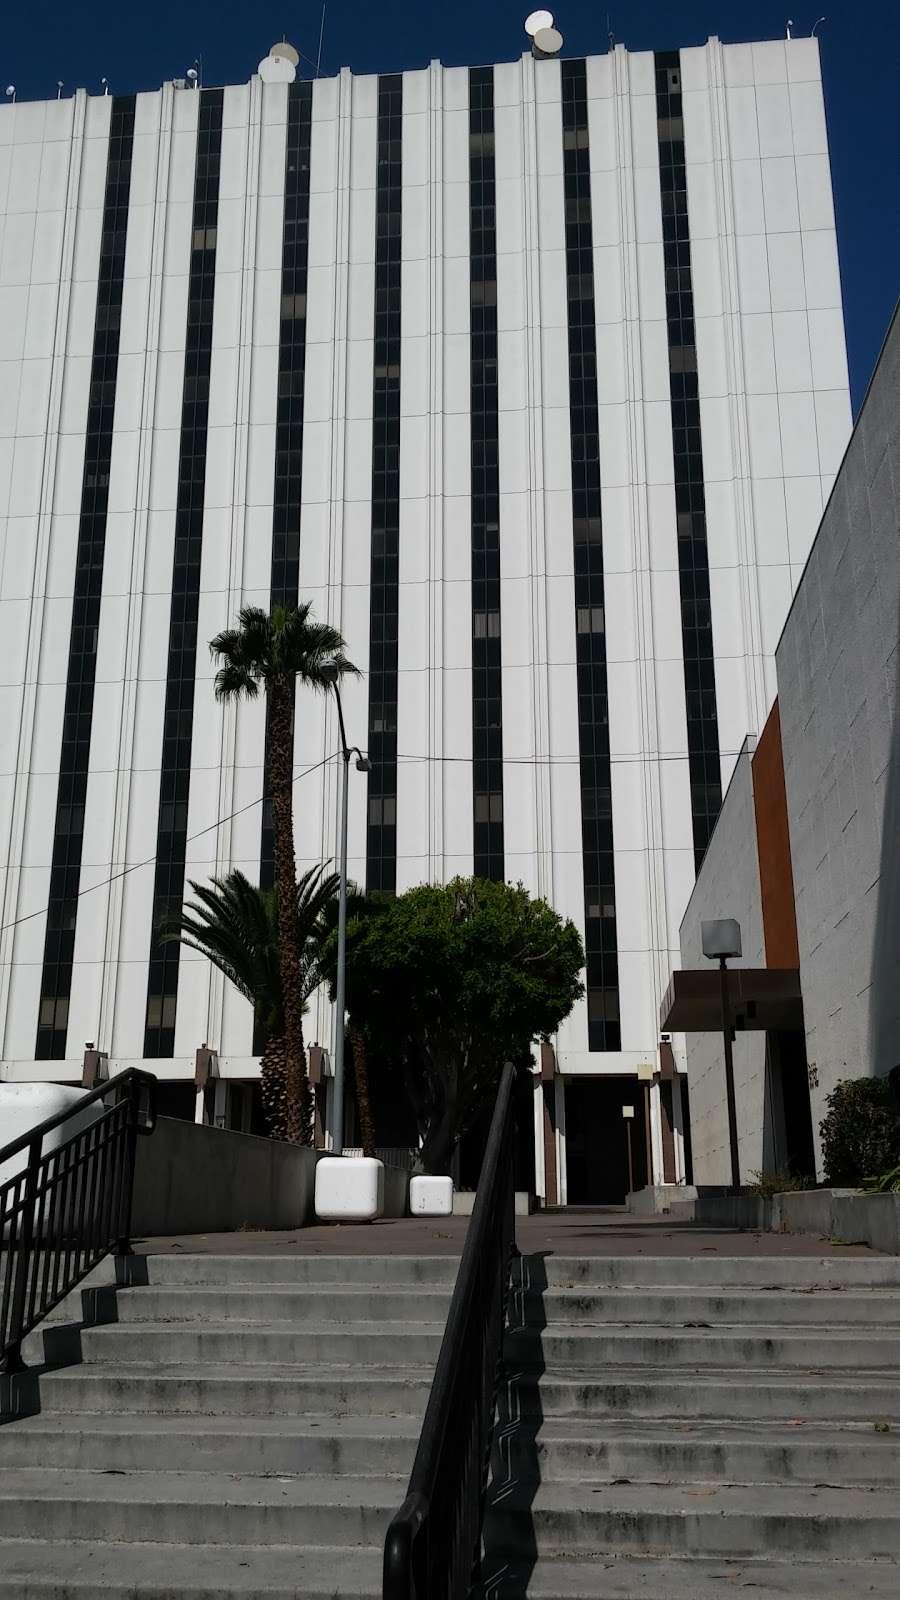 Compton Courthouse - courthouse  | Photo 5 of 10 | Address: 200 W Compton Blvd, Compton, CA 90220, USA | Phone: (310) 605-4065